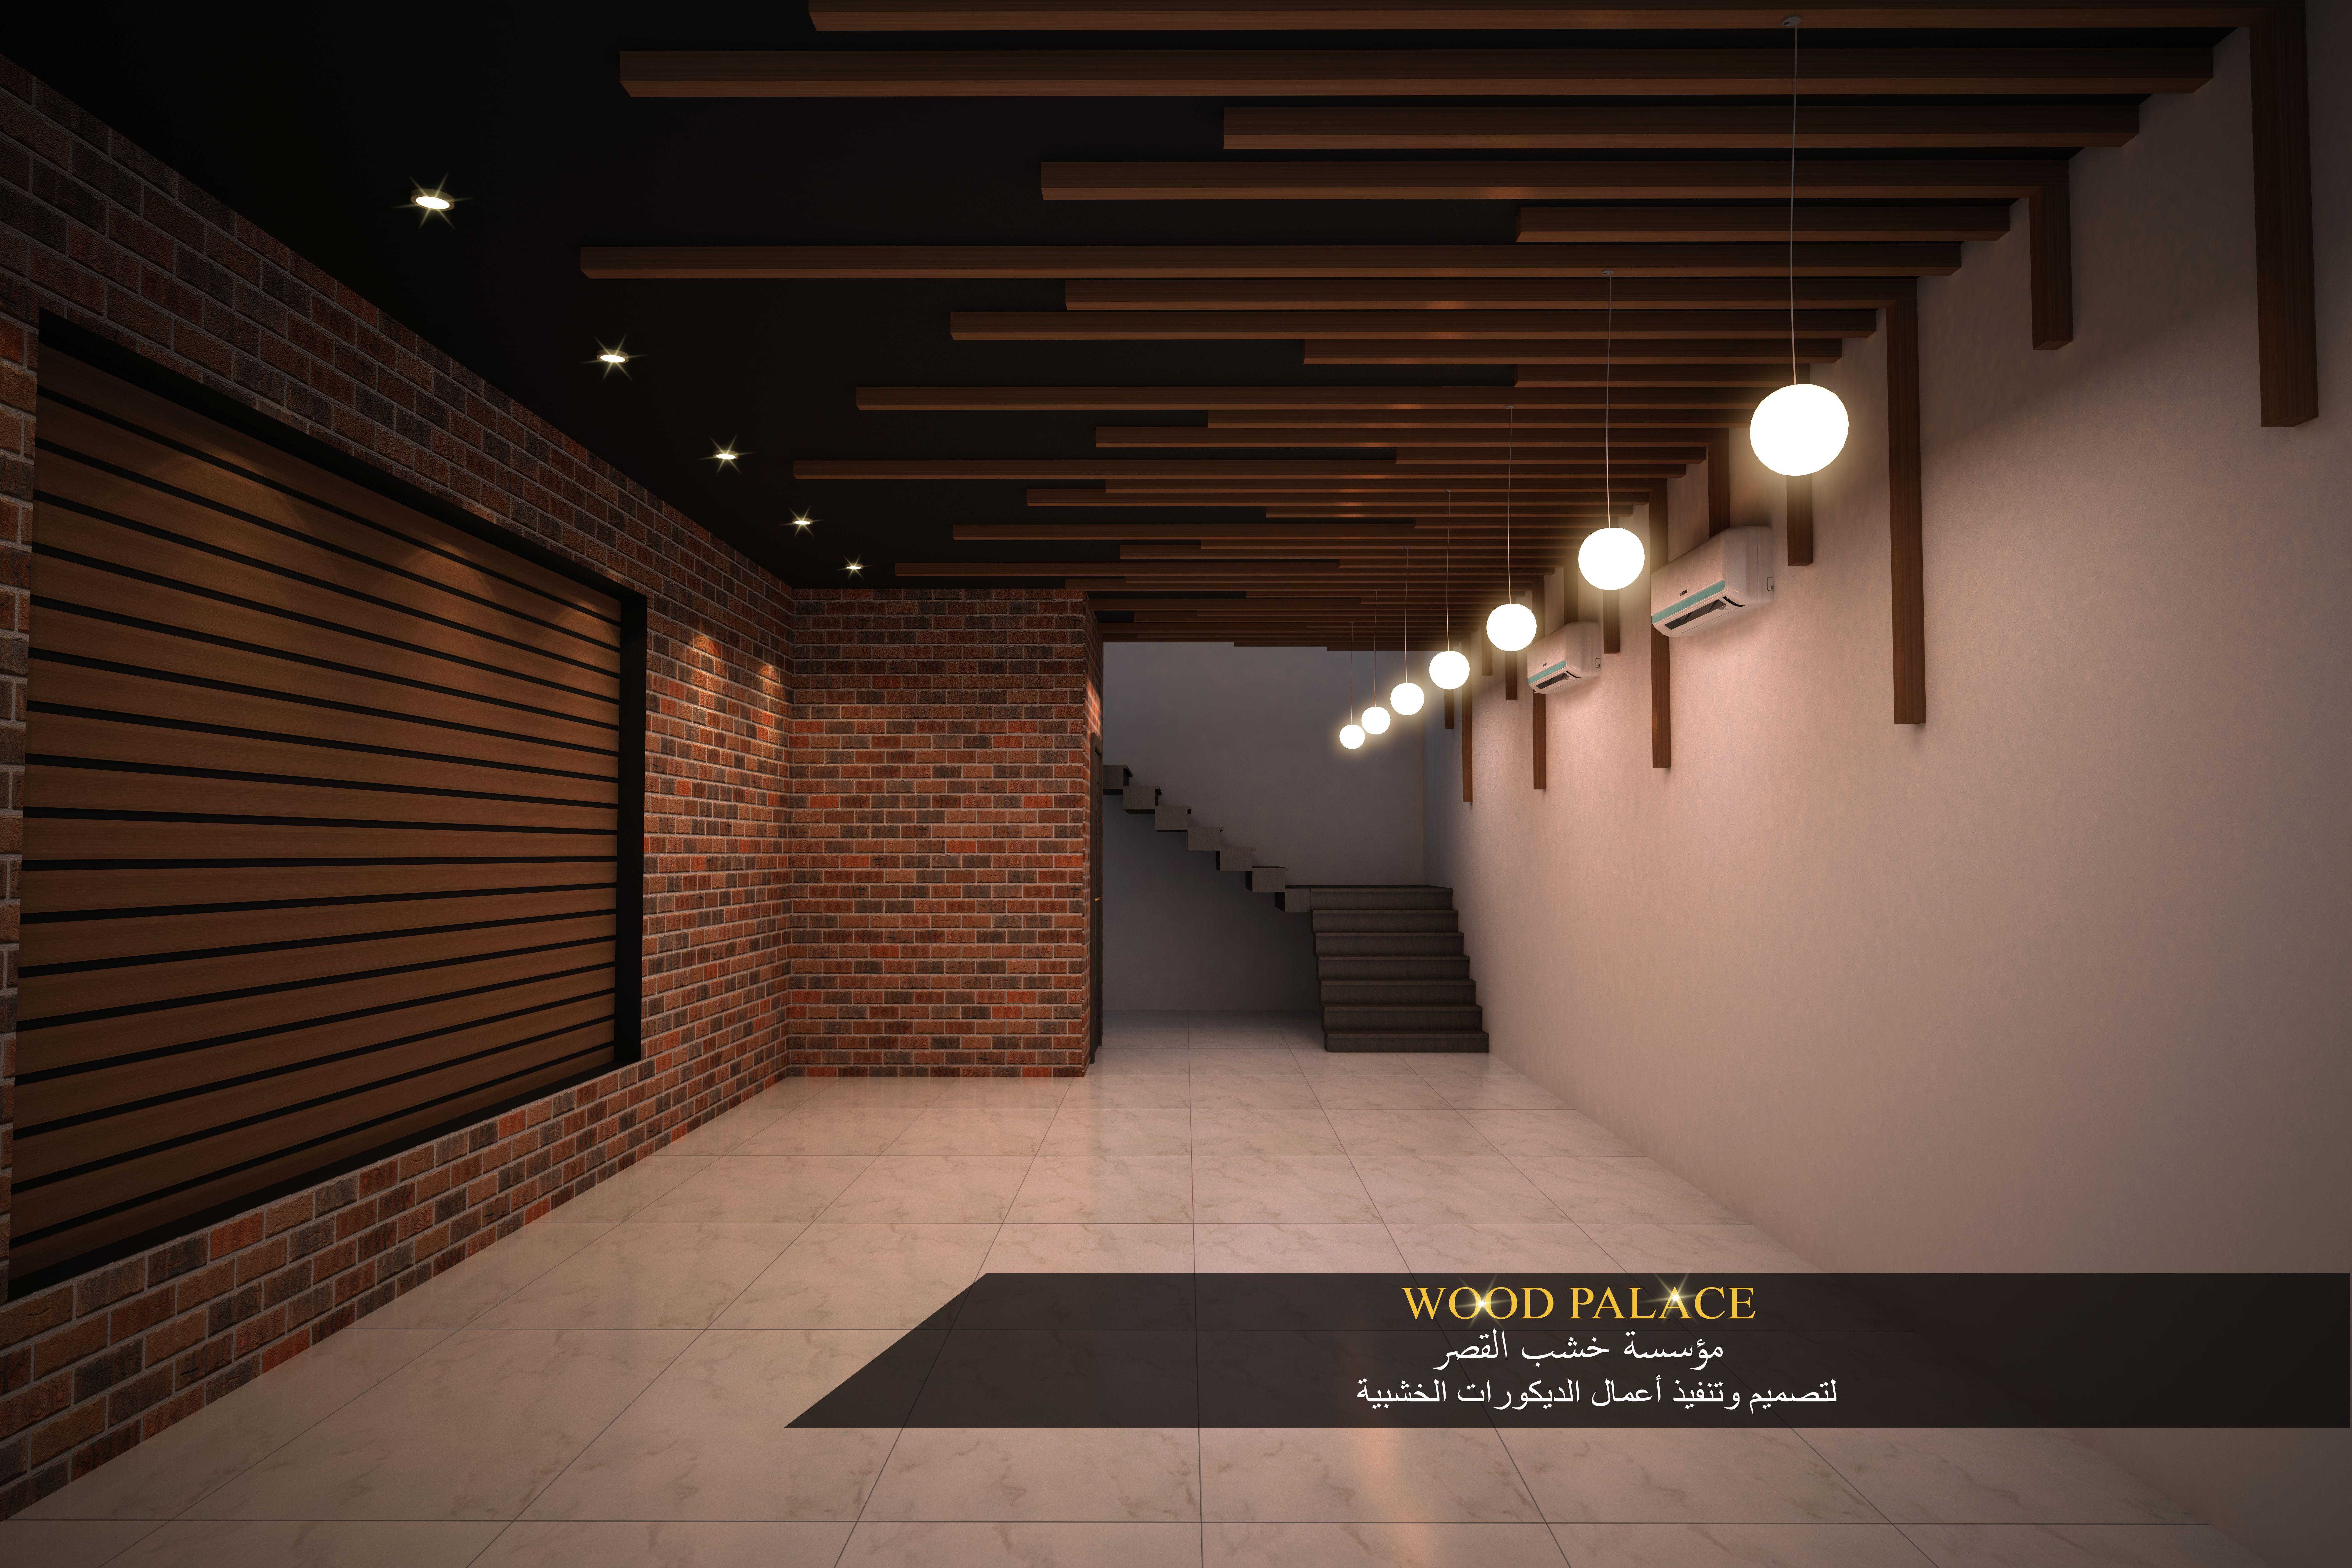 Pin By Khaled On لوحات محلات تجارية Home Decor Decor Home